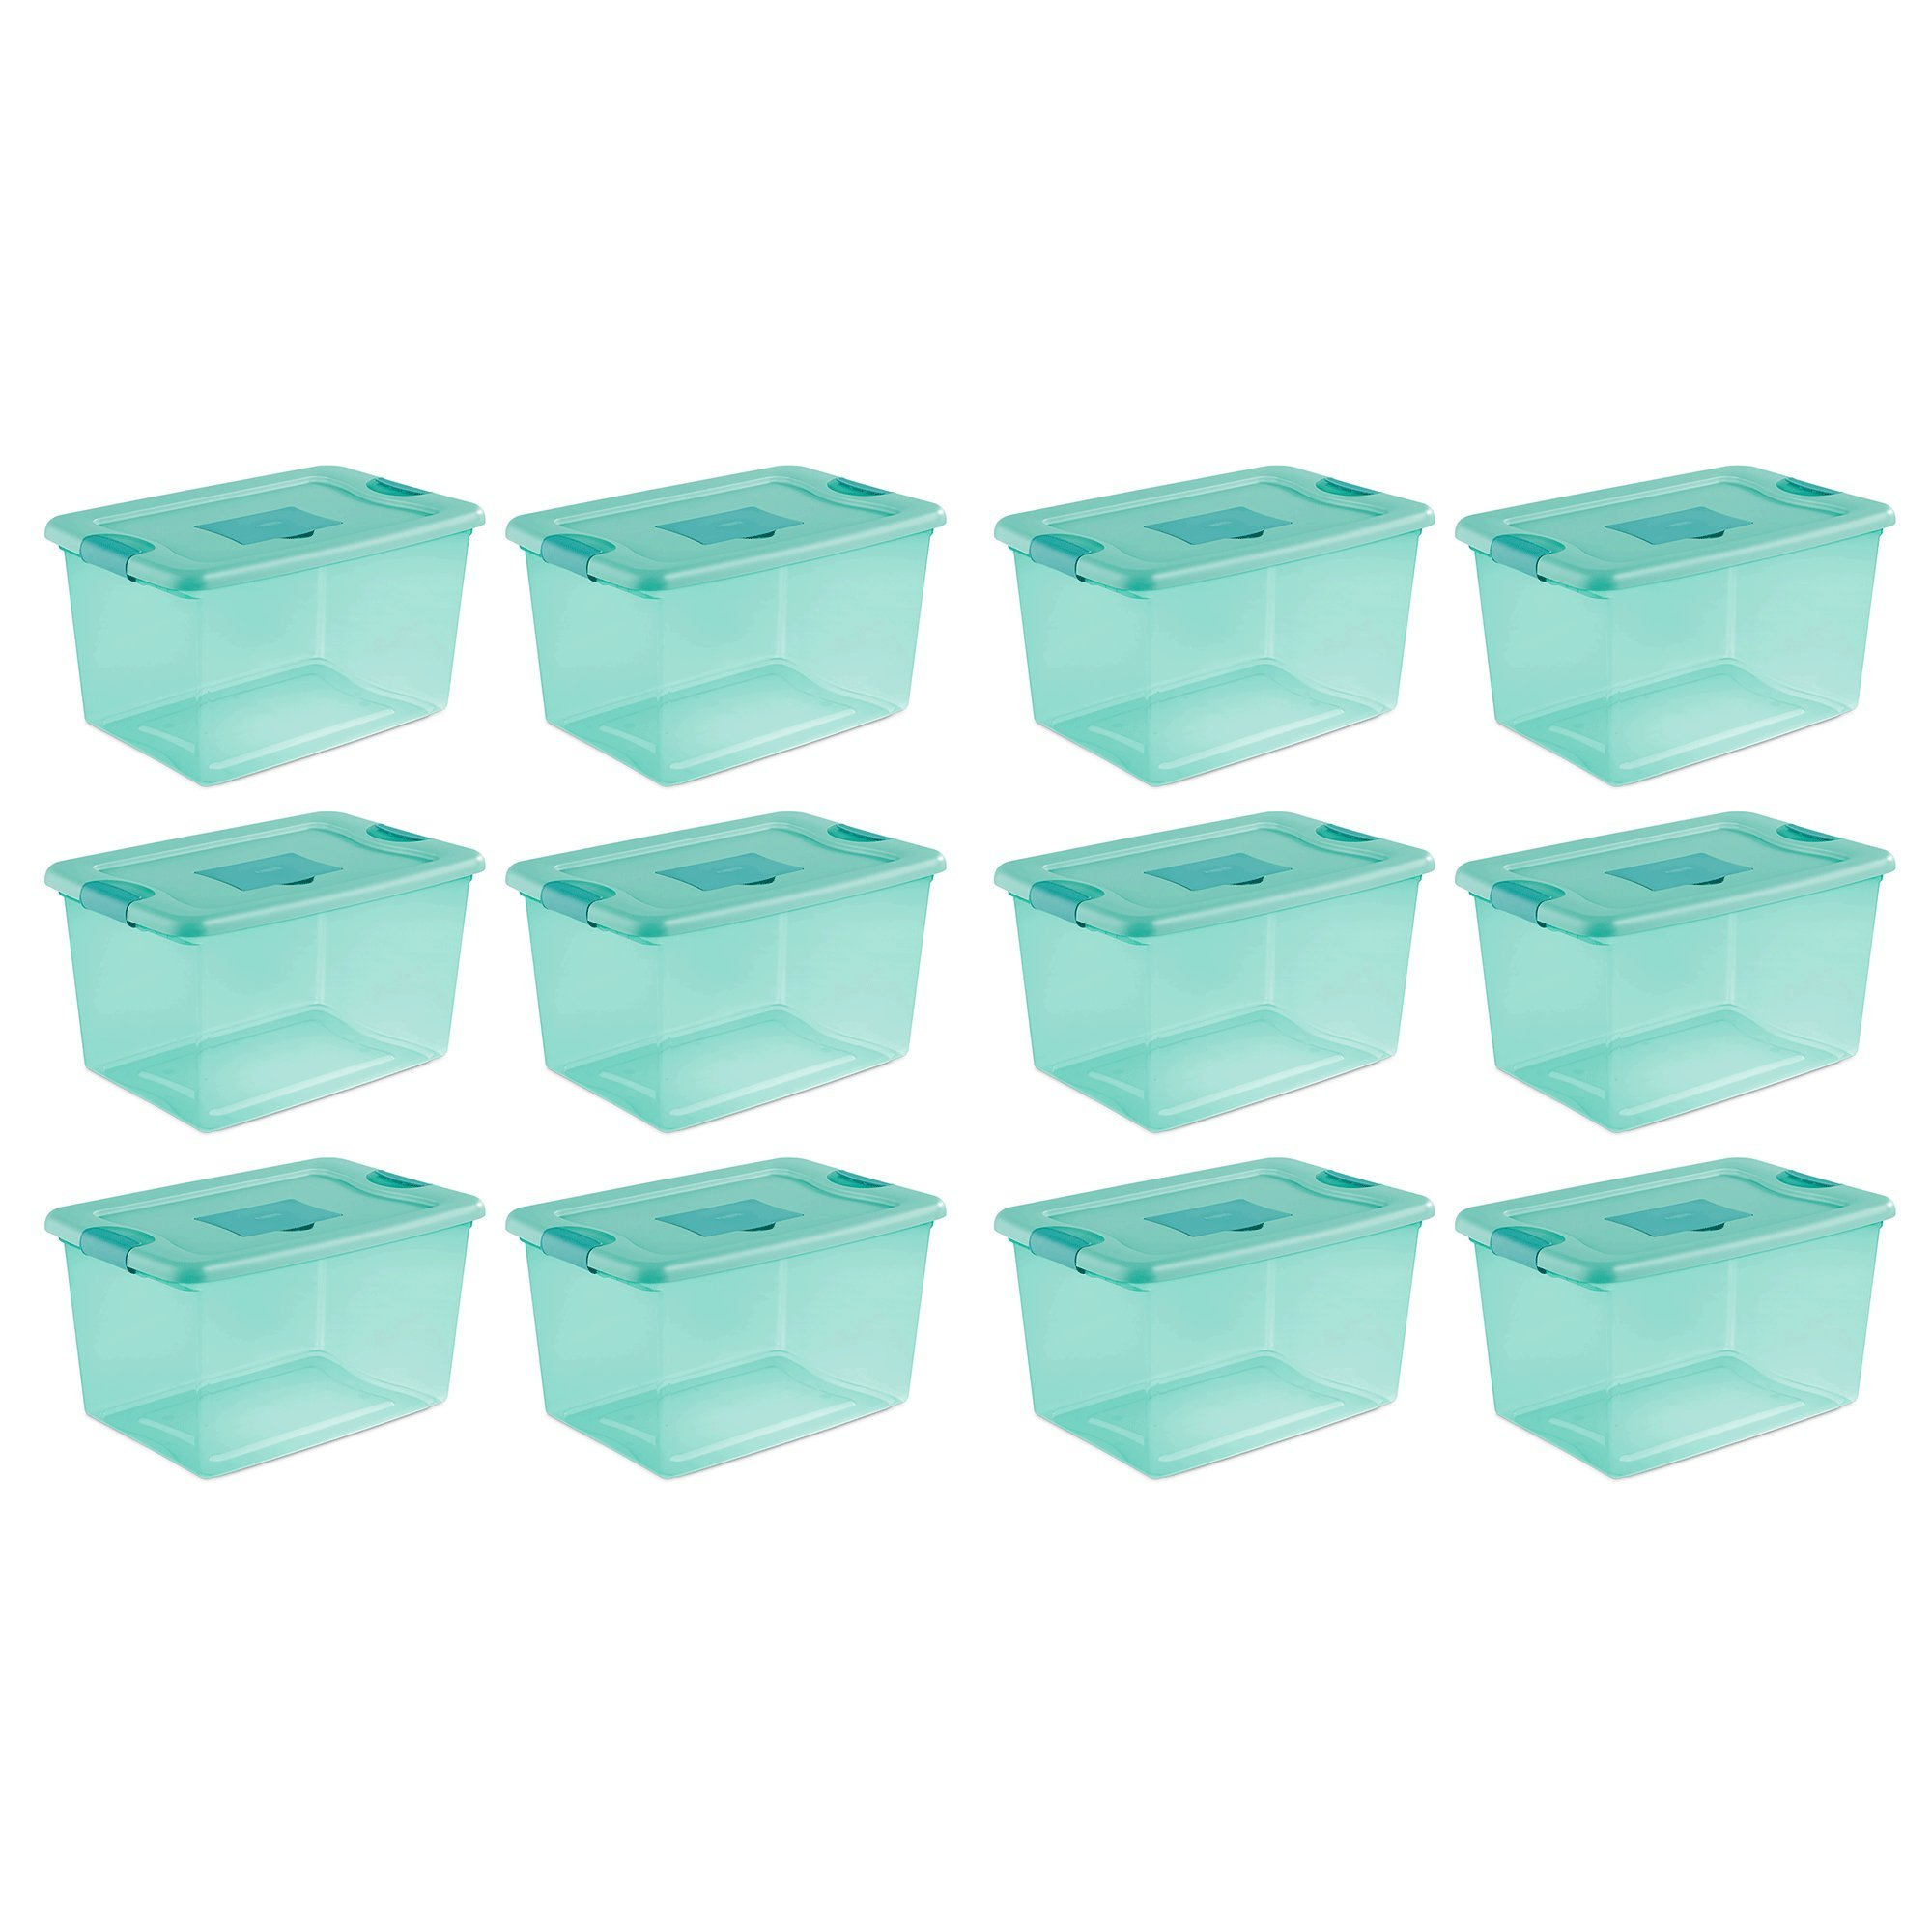 STERILITE 64 Quart Fresh Scent Stackable Plastic Storage Box Container (12 Pack)